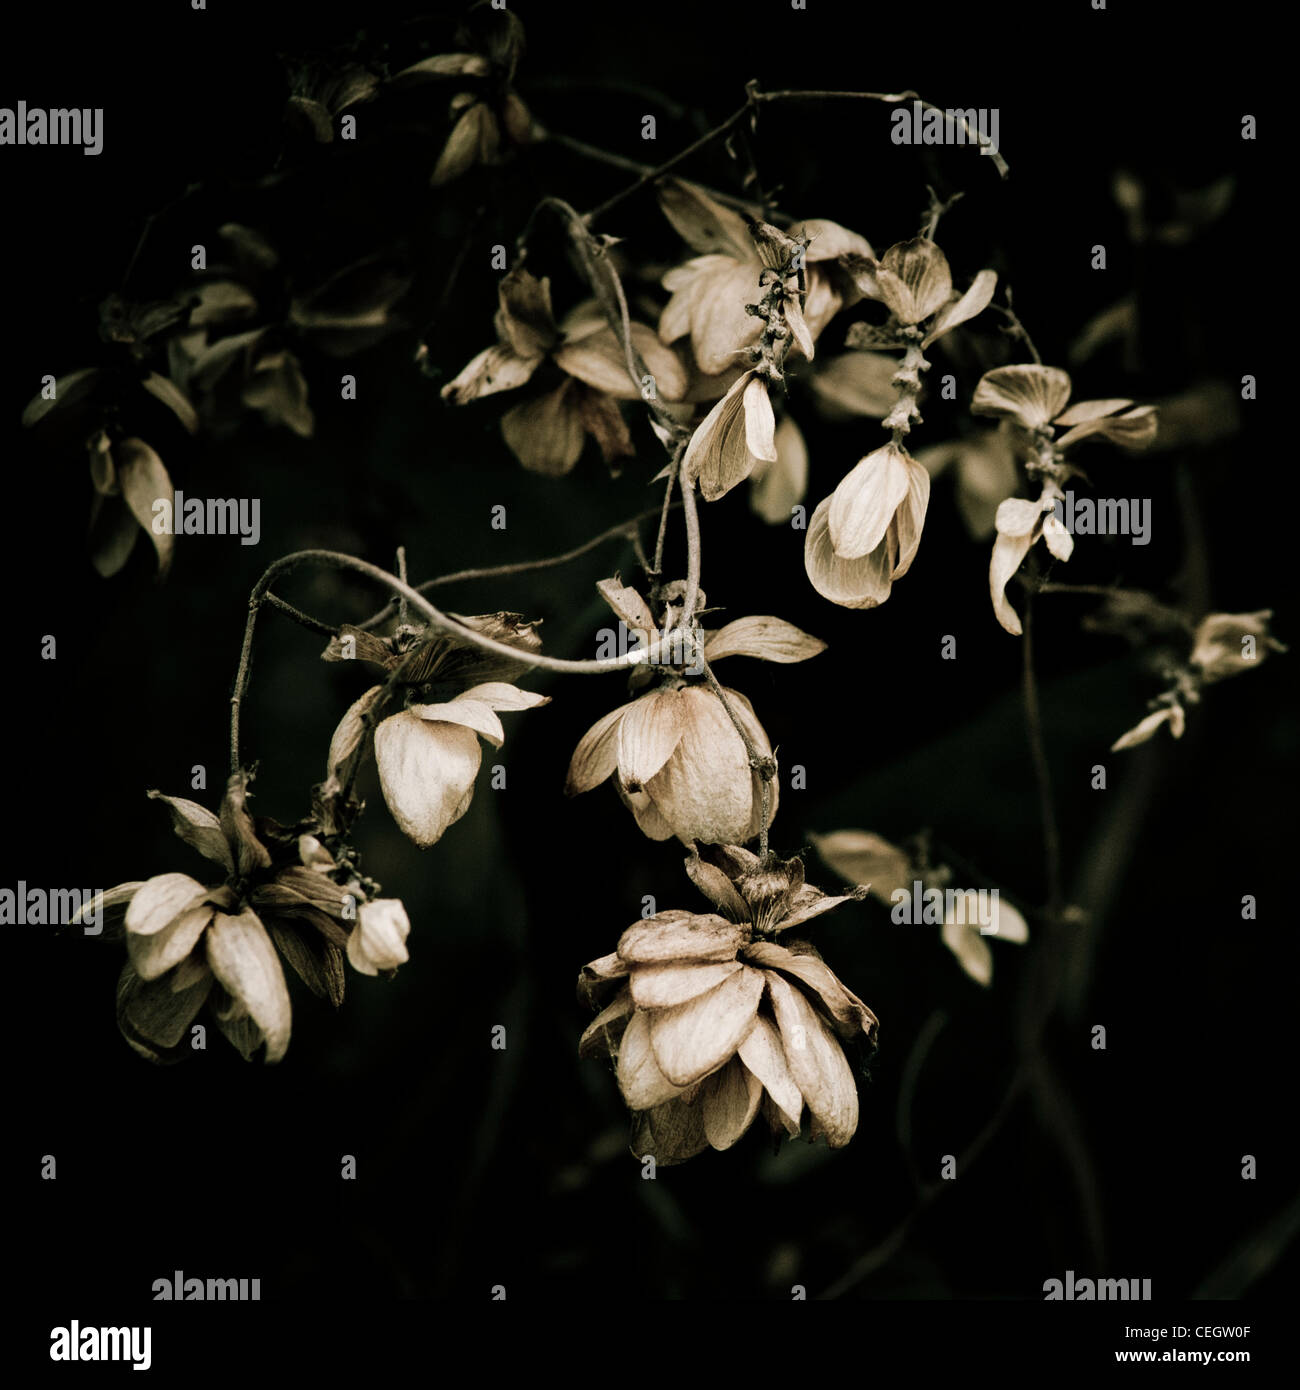 Wilting flowers - Stock Image